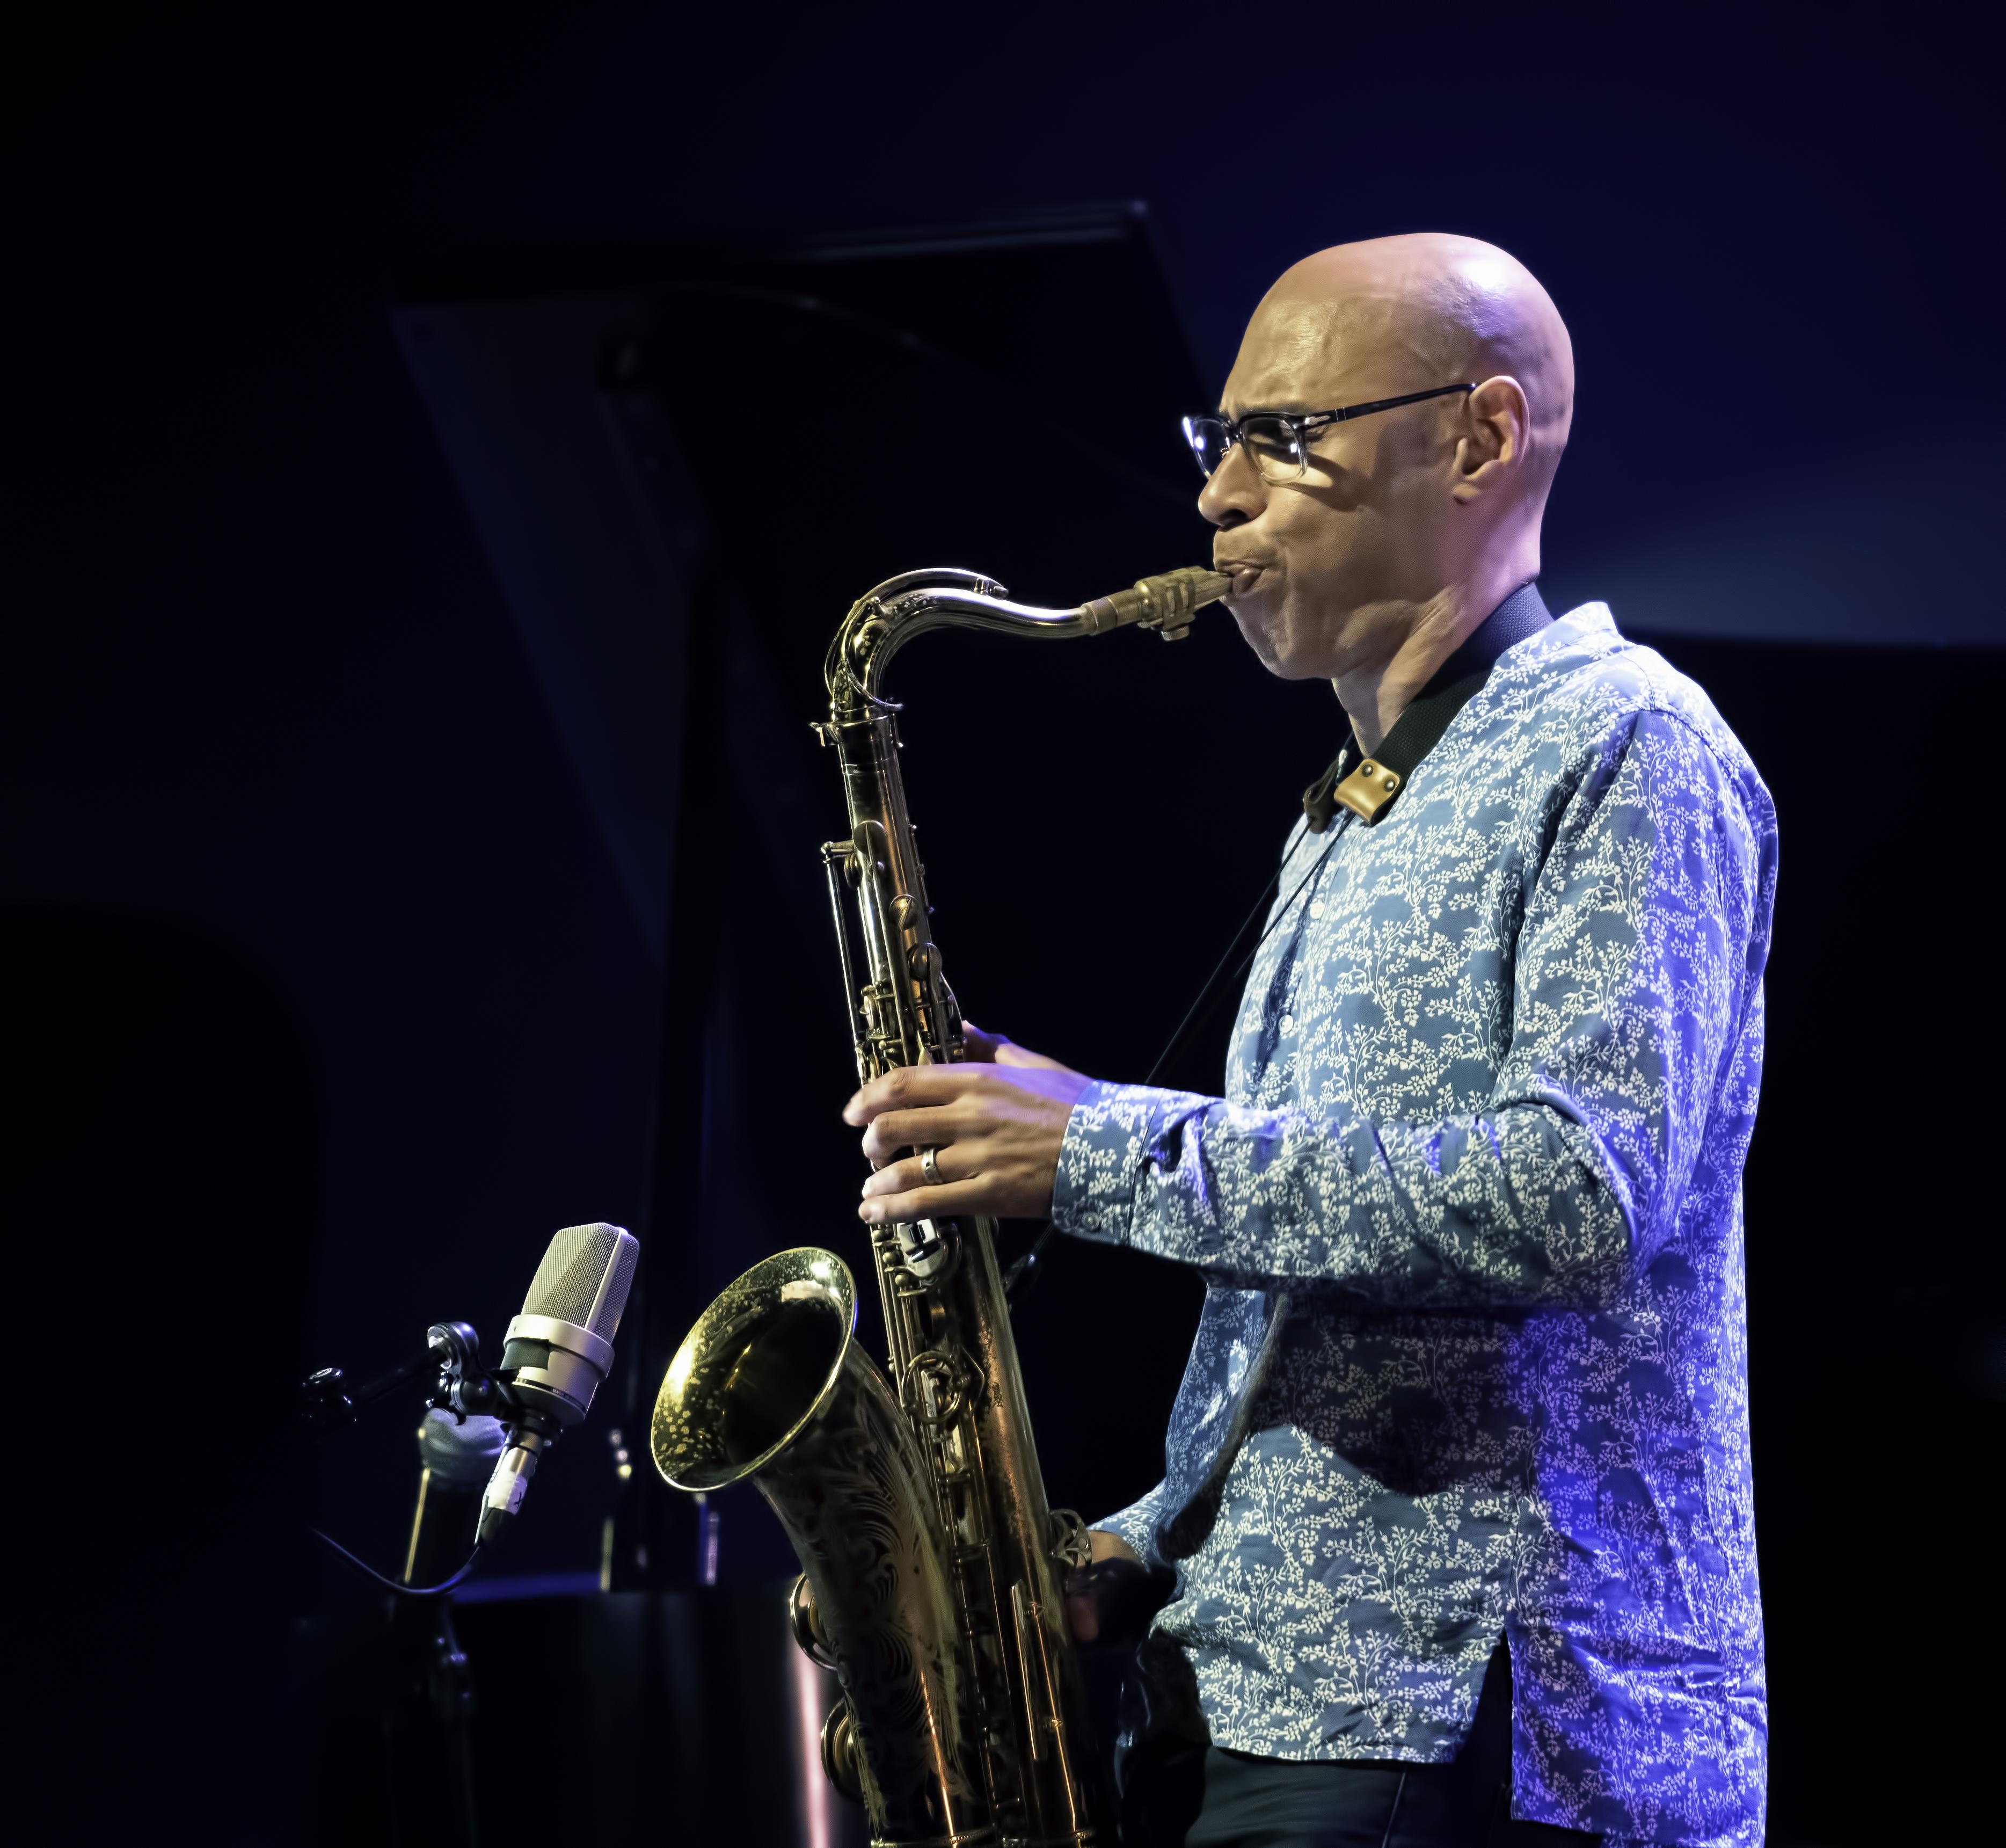 Joshua Redman with Quartet At The Montreal International Jazz Festival 2019